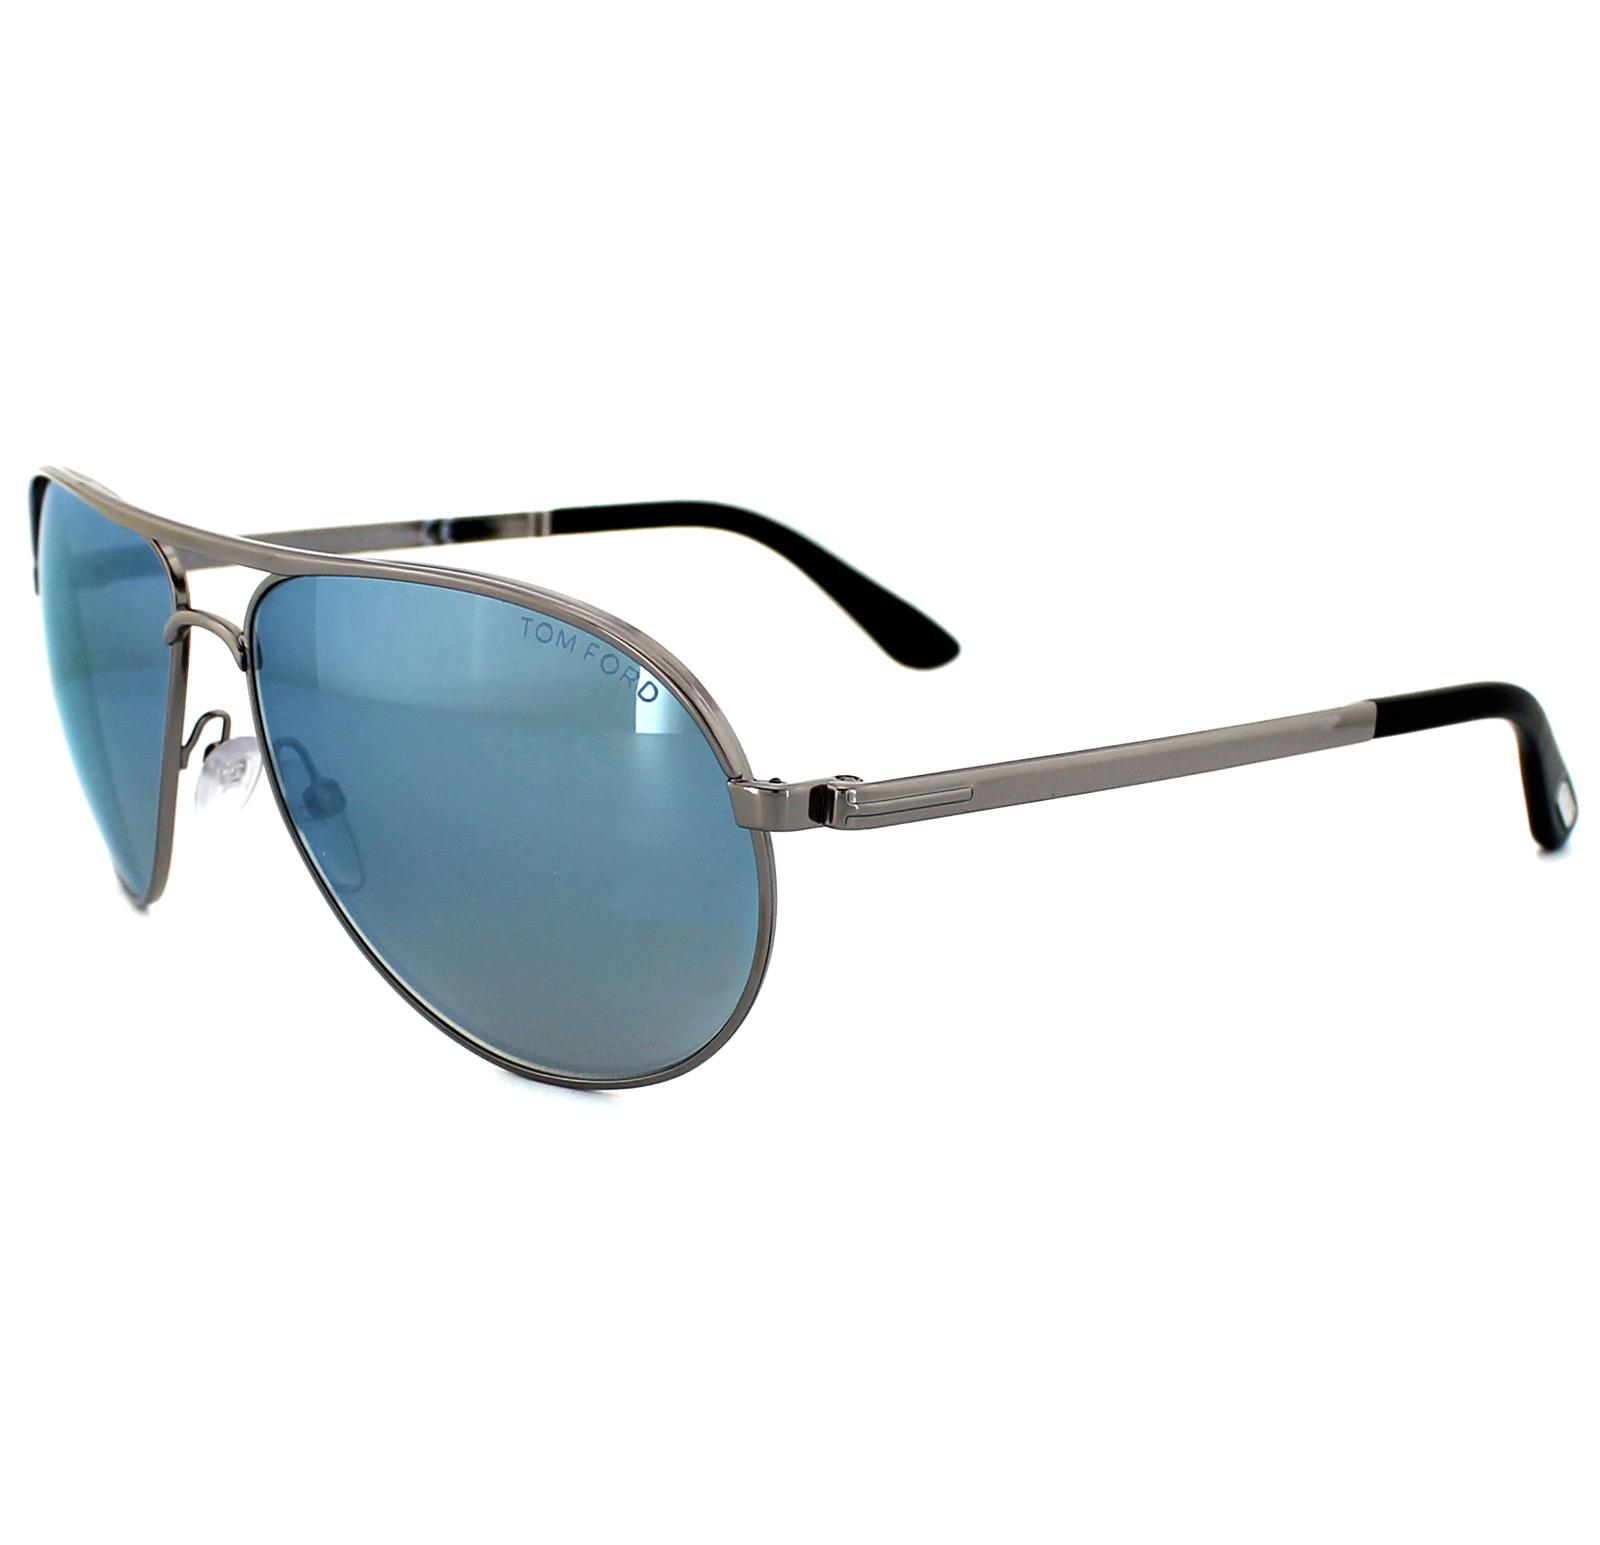 bc1c32d24c9a Sentinel Tom Ford Sunglasses 0144 Marko 14X Shiny Light Ruthenium Blue  Mirror